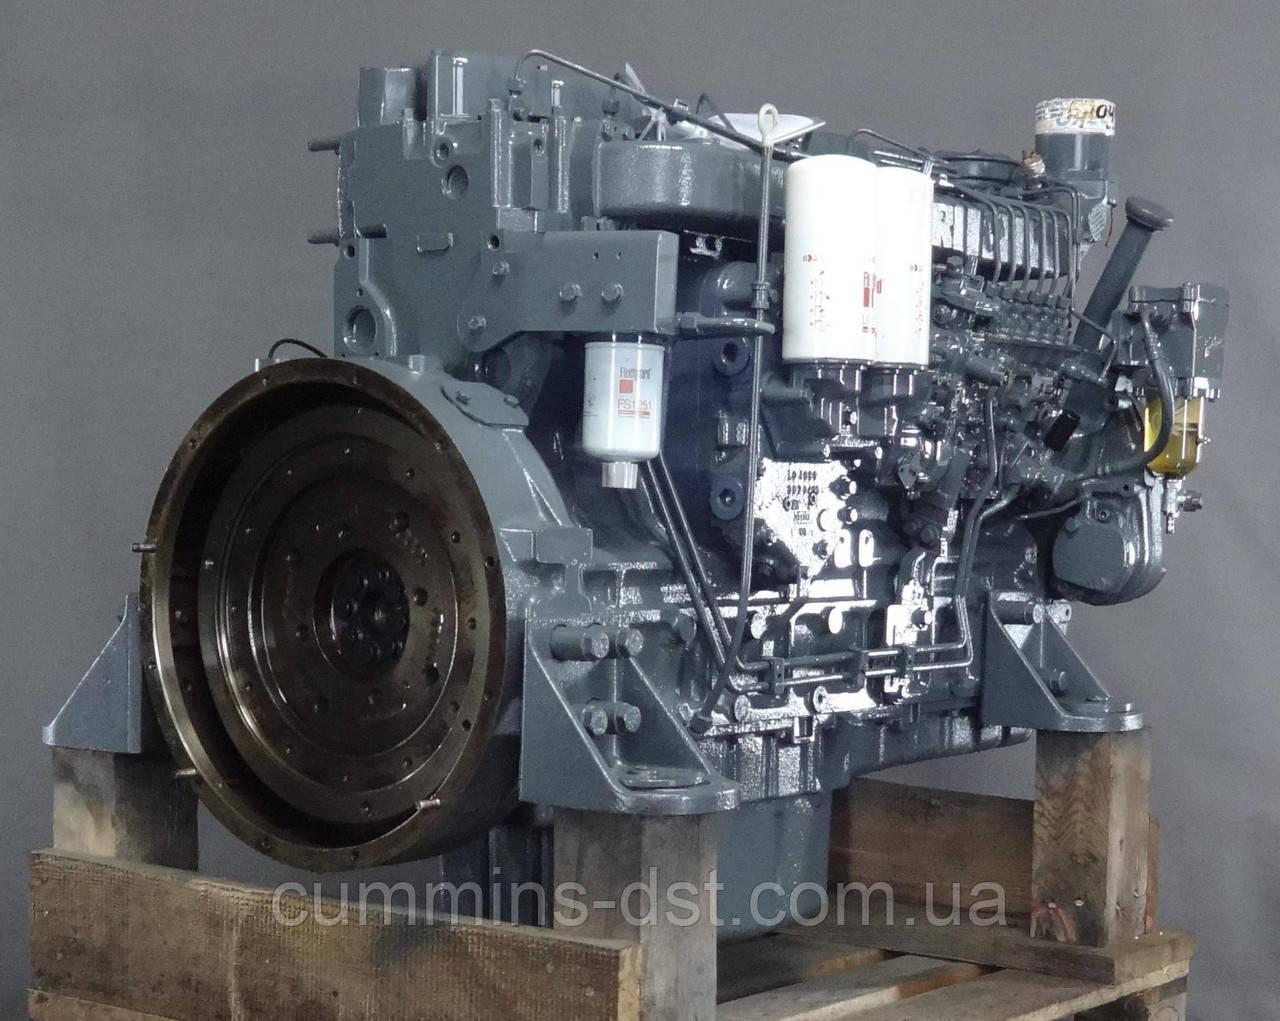 Двигатель Б/У Liebherr D 926 TI-E